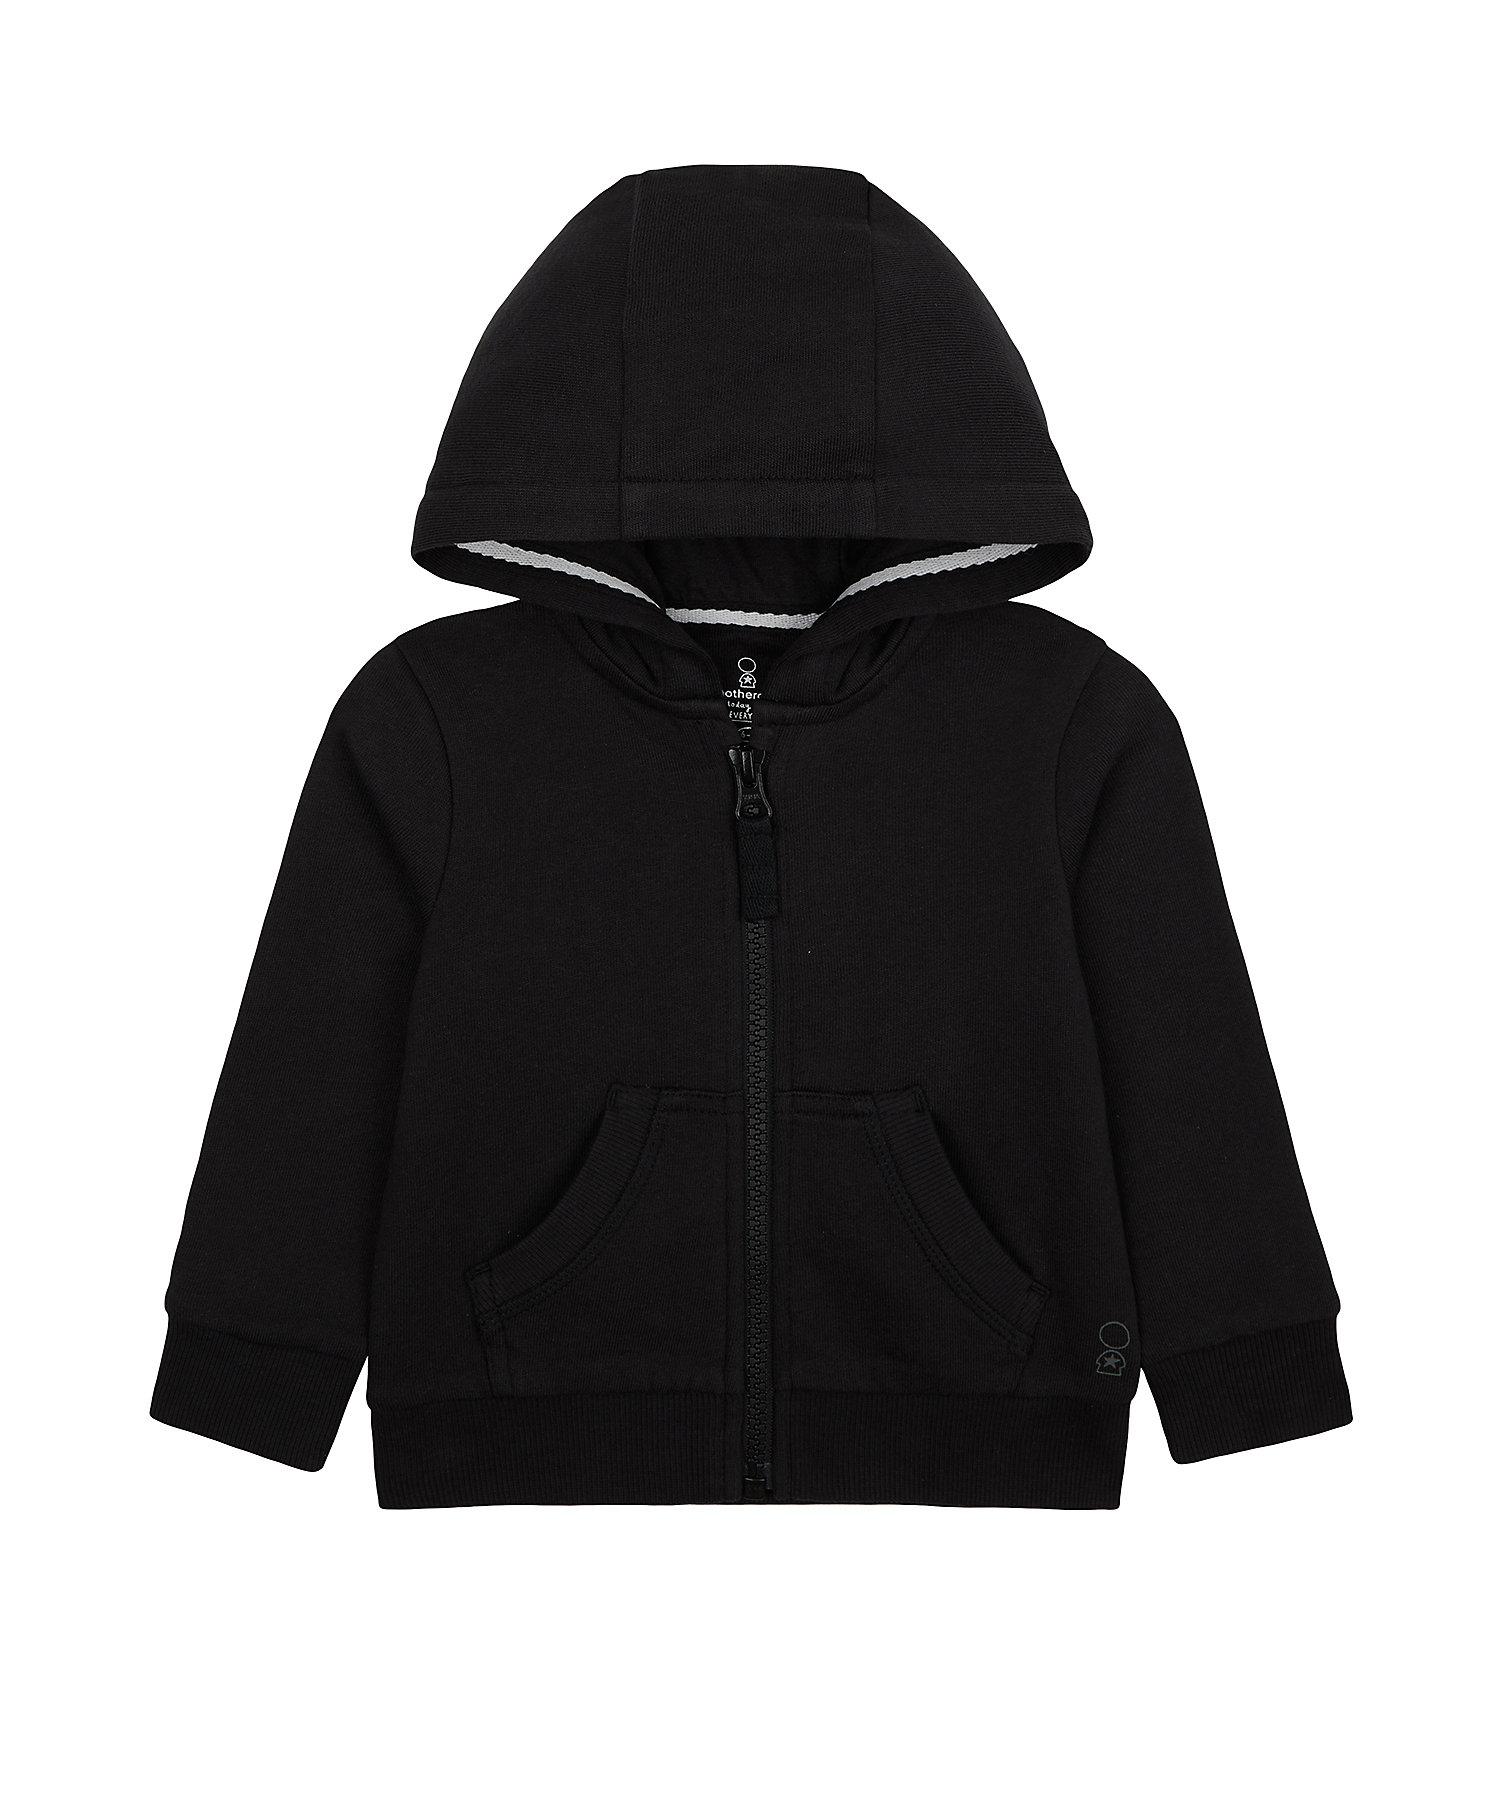 Mothercare | Boys Full Sleeves Hooded Sweatshirt With Zip Opening - Black